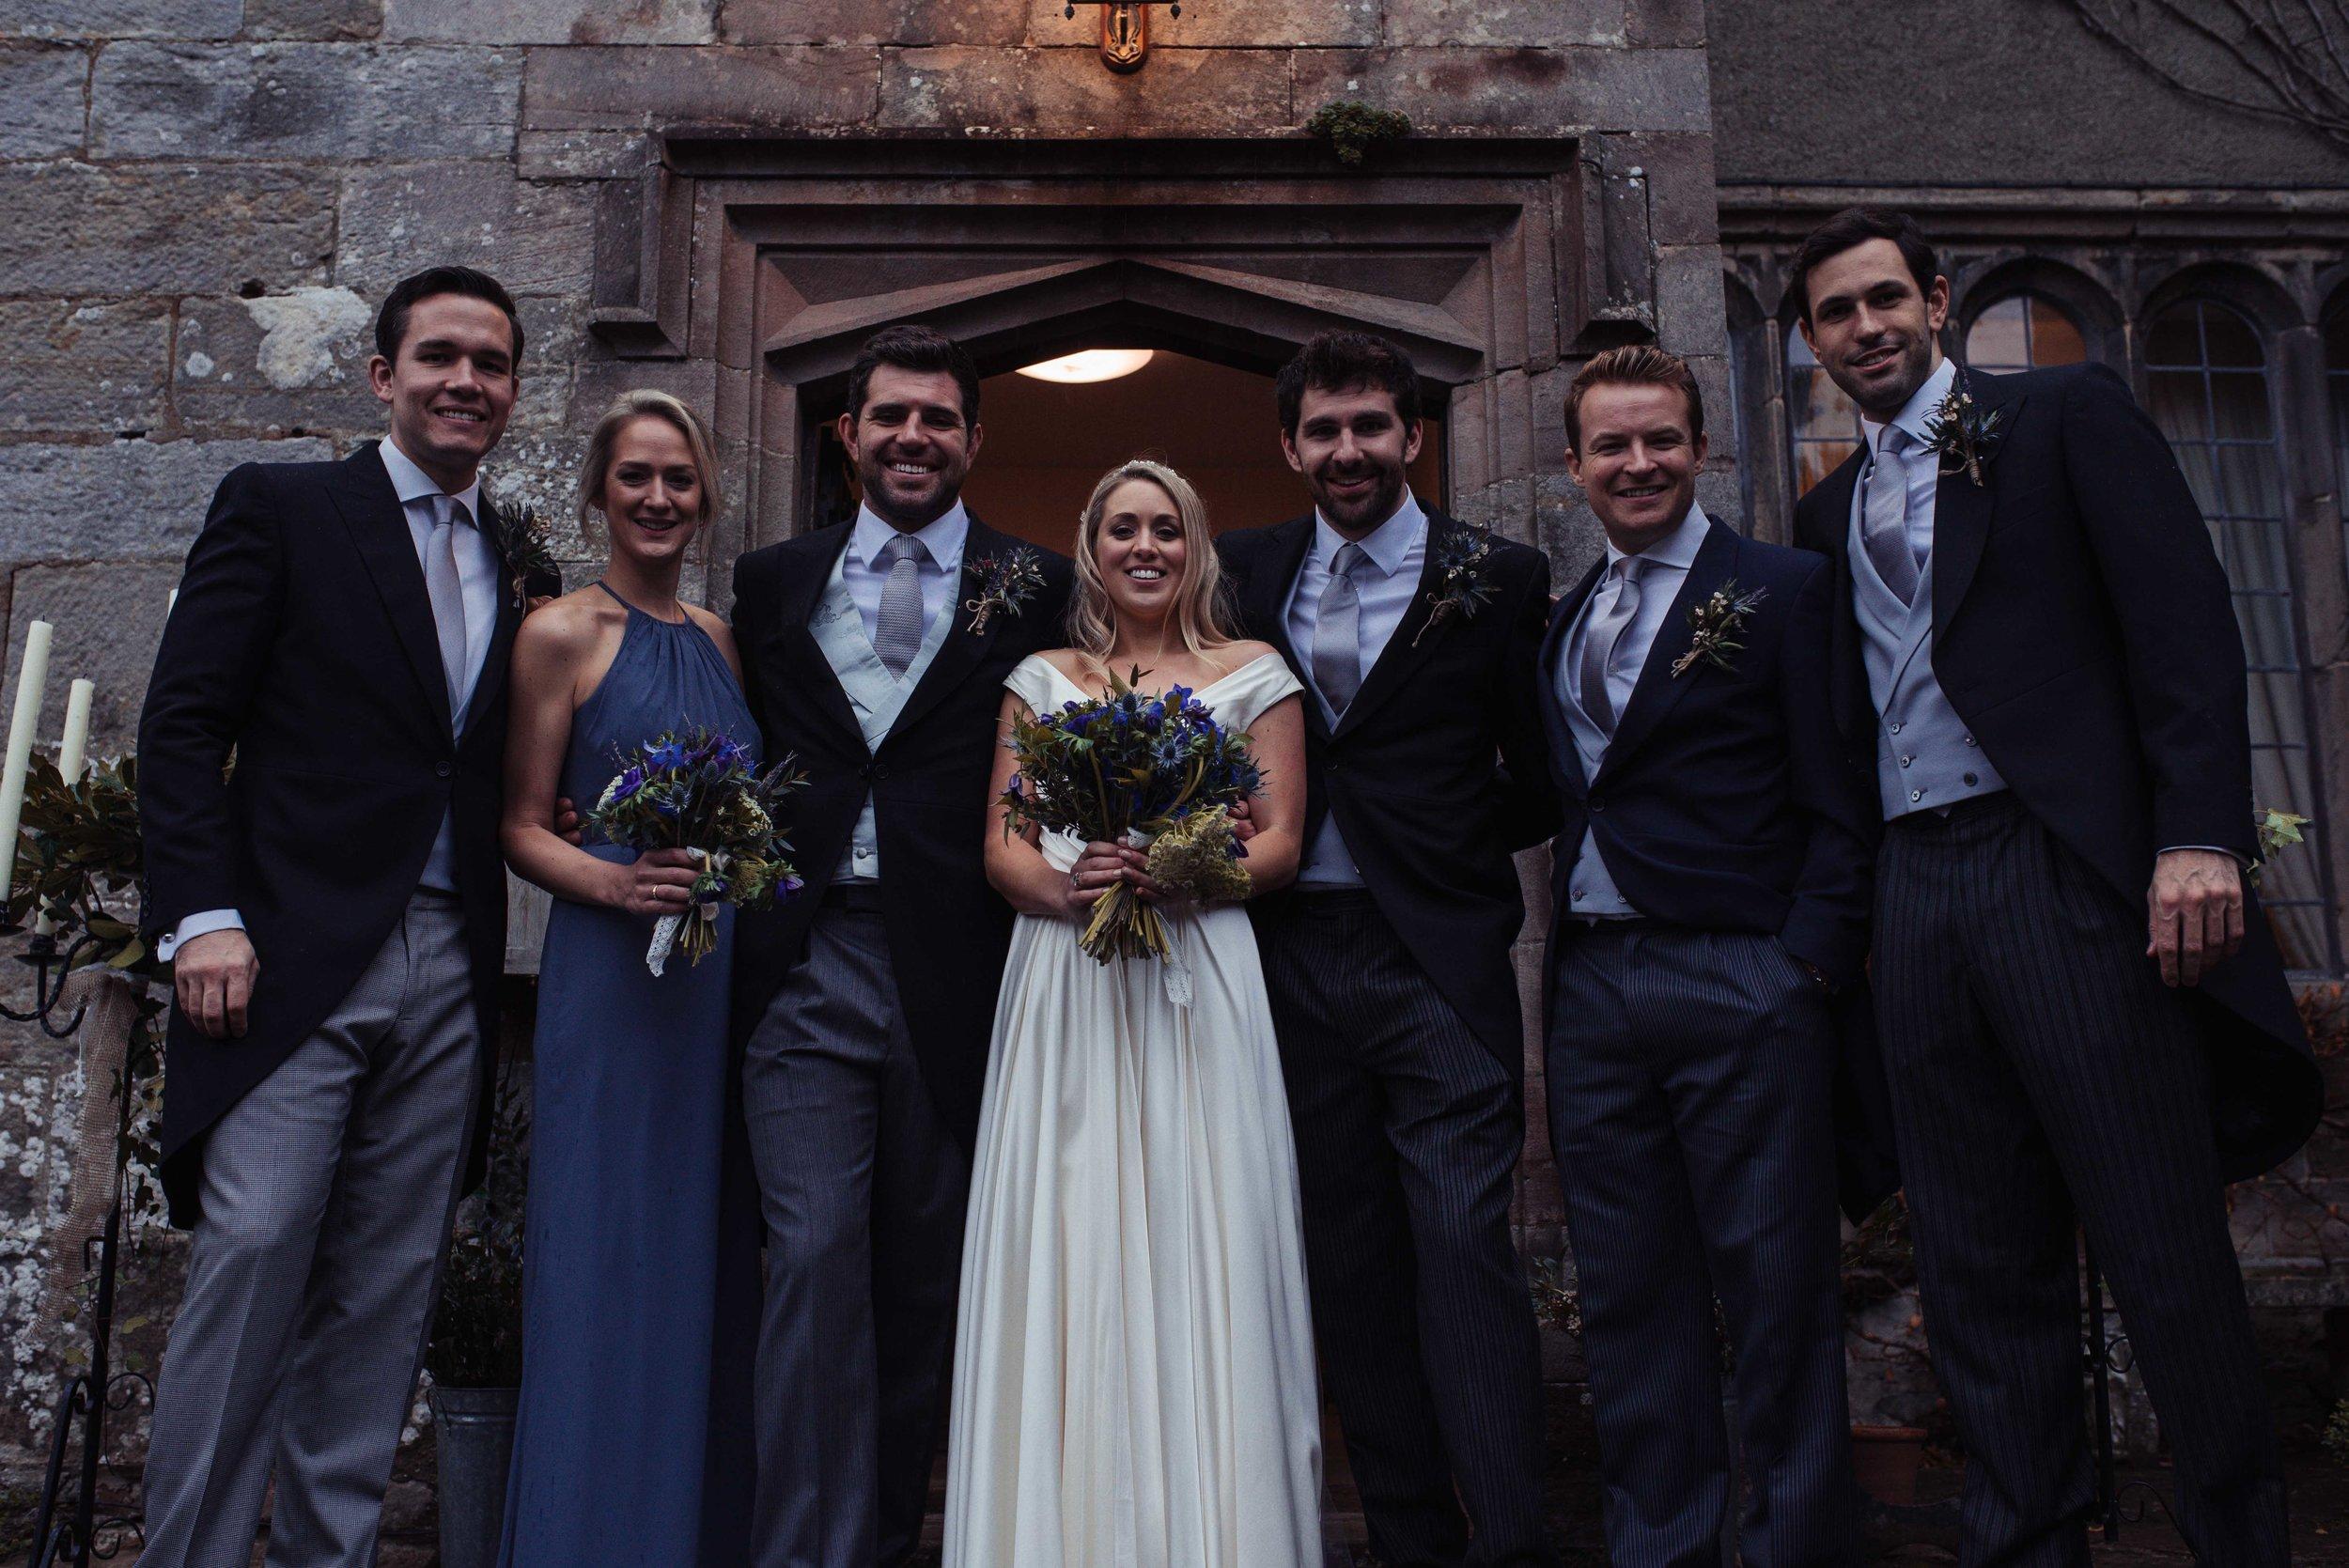 Askham-Hall-Wedding-Photography-58.jpg